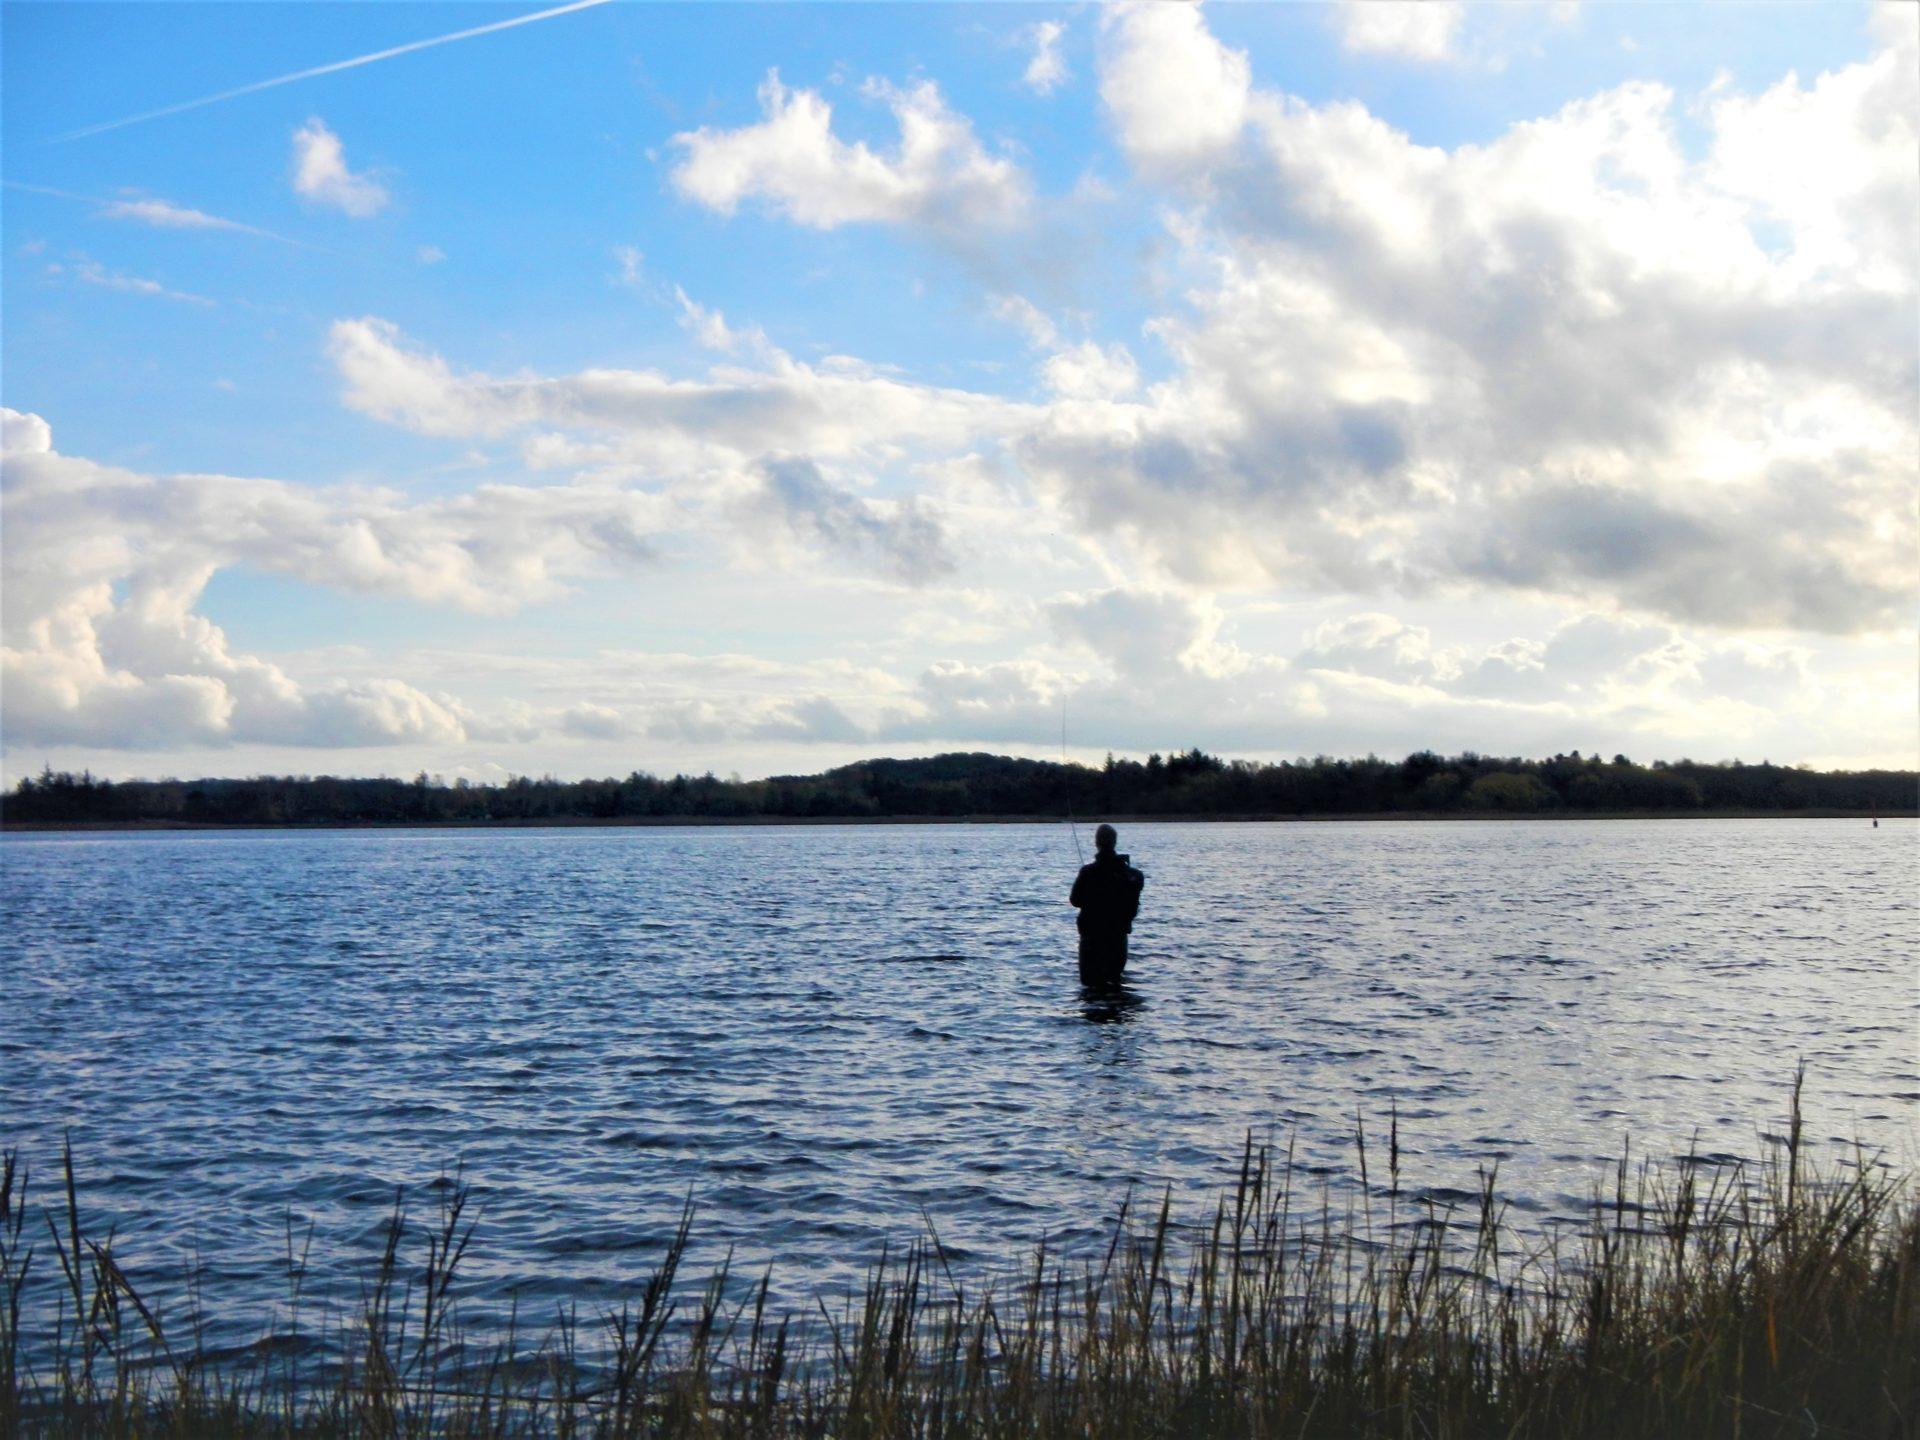 Information om lystfiskeri i Skive Fjord.